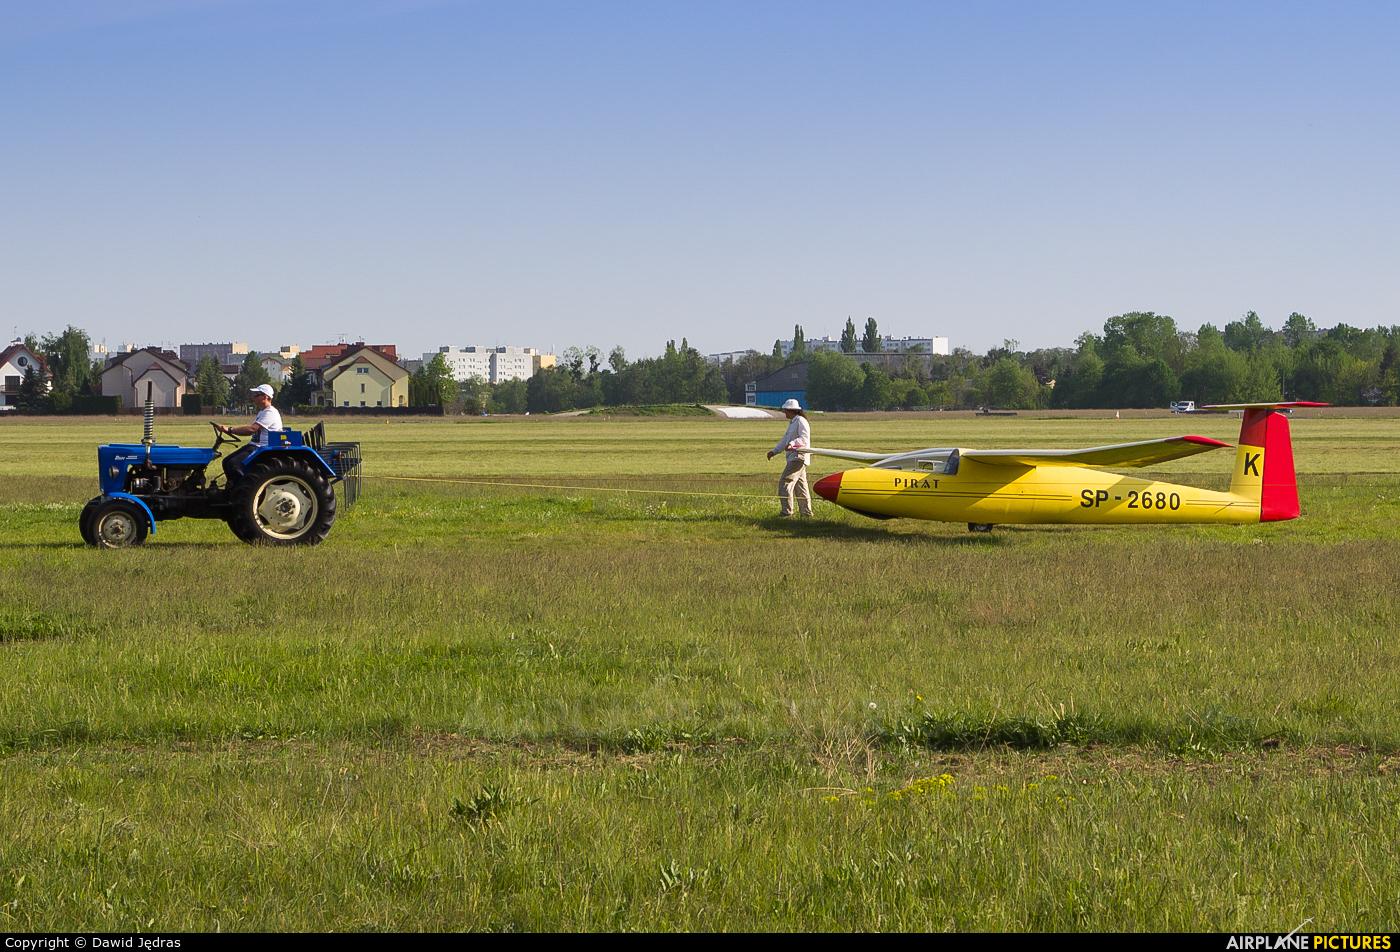 Aeroclub Warsaw SP-2680 aircraft at Warsaw - Babice